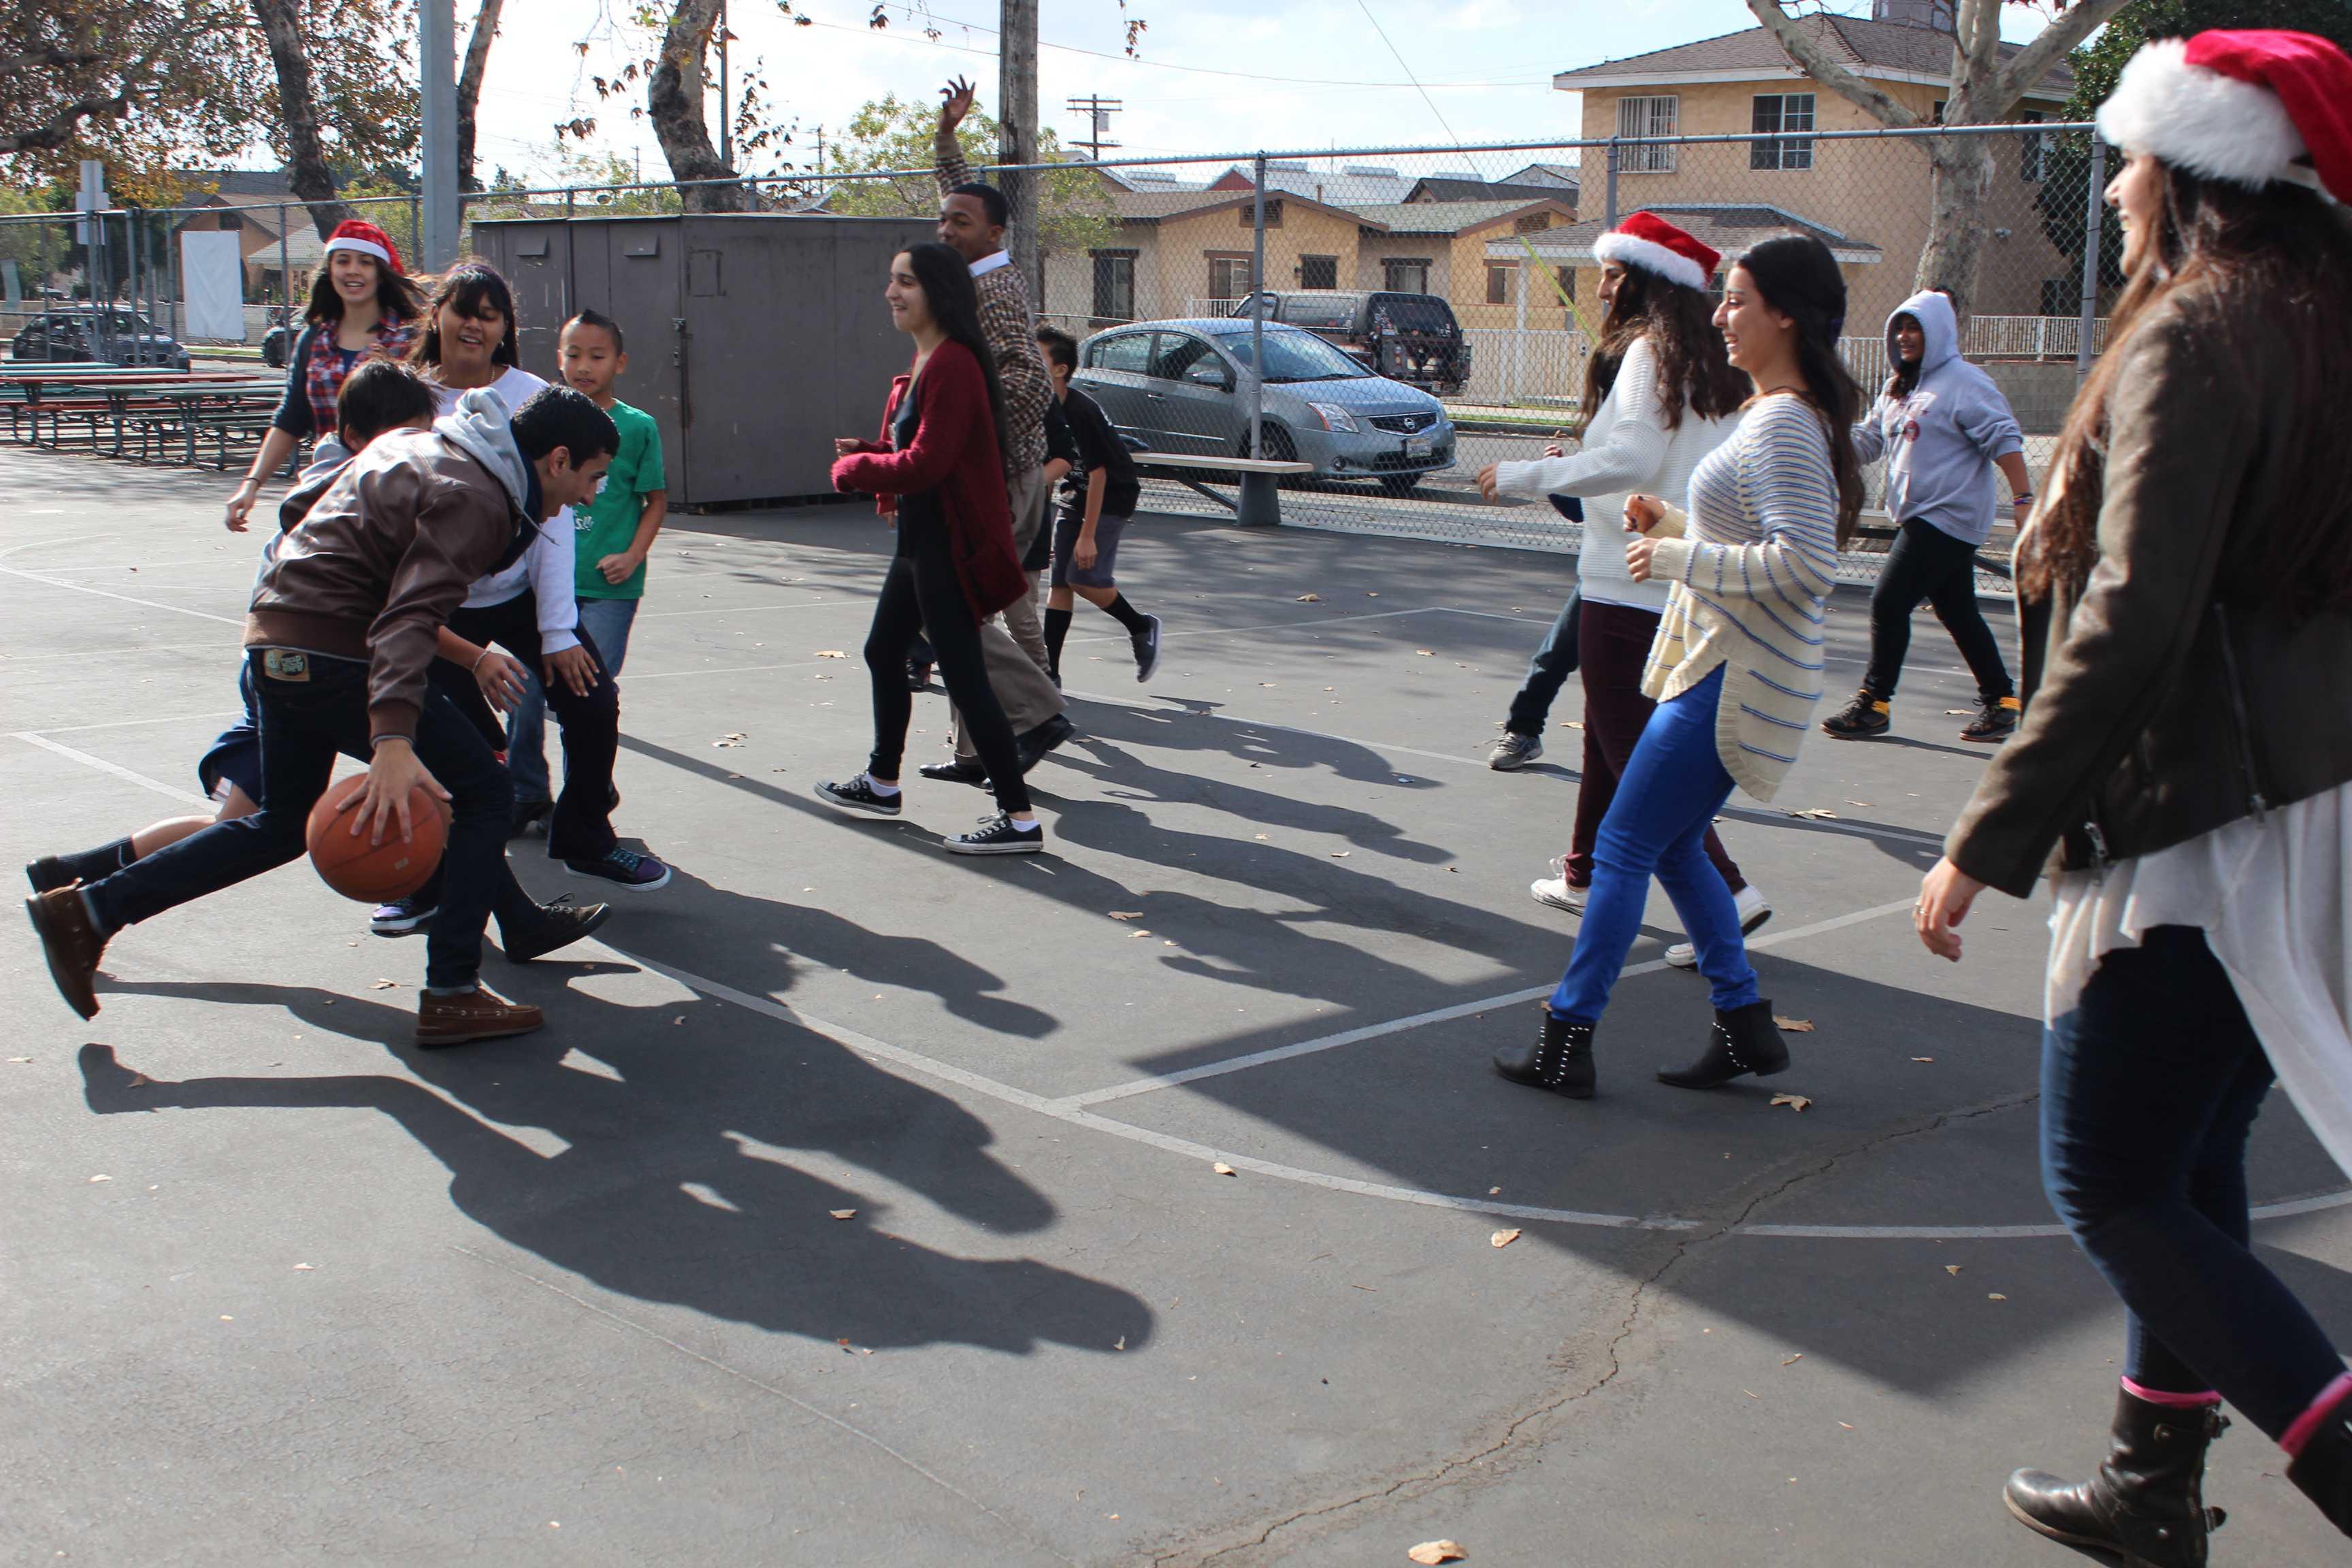 Seniors Matthew Ghermezi, Jessica Mehraban and Alex Eljam finish up a game of basketball.